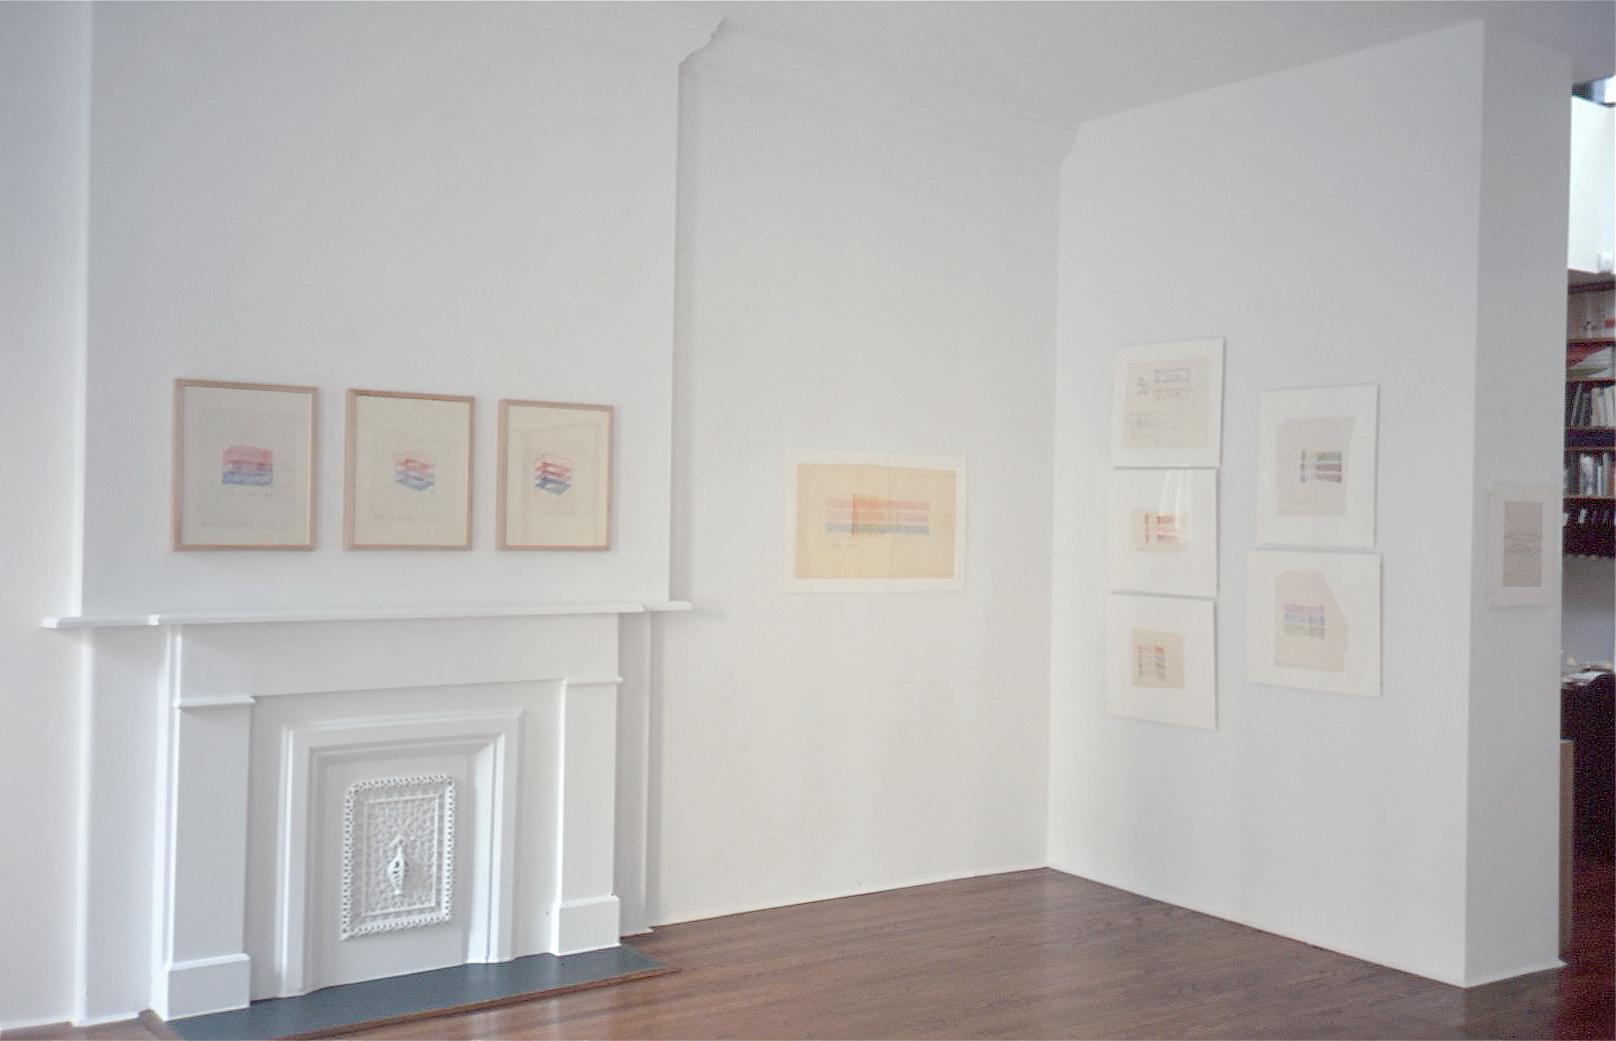 Max Neuhaus at lawrence Markey 2002 11.jpeg